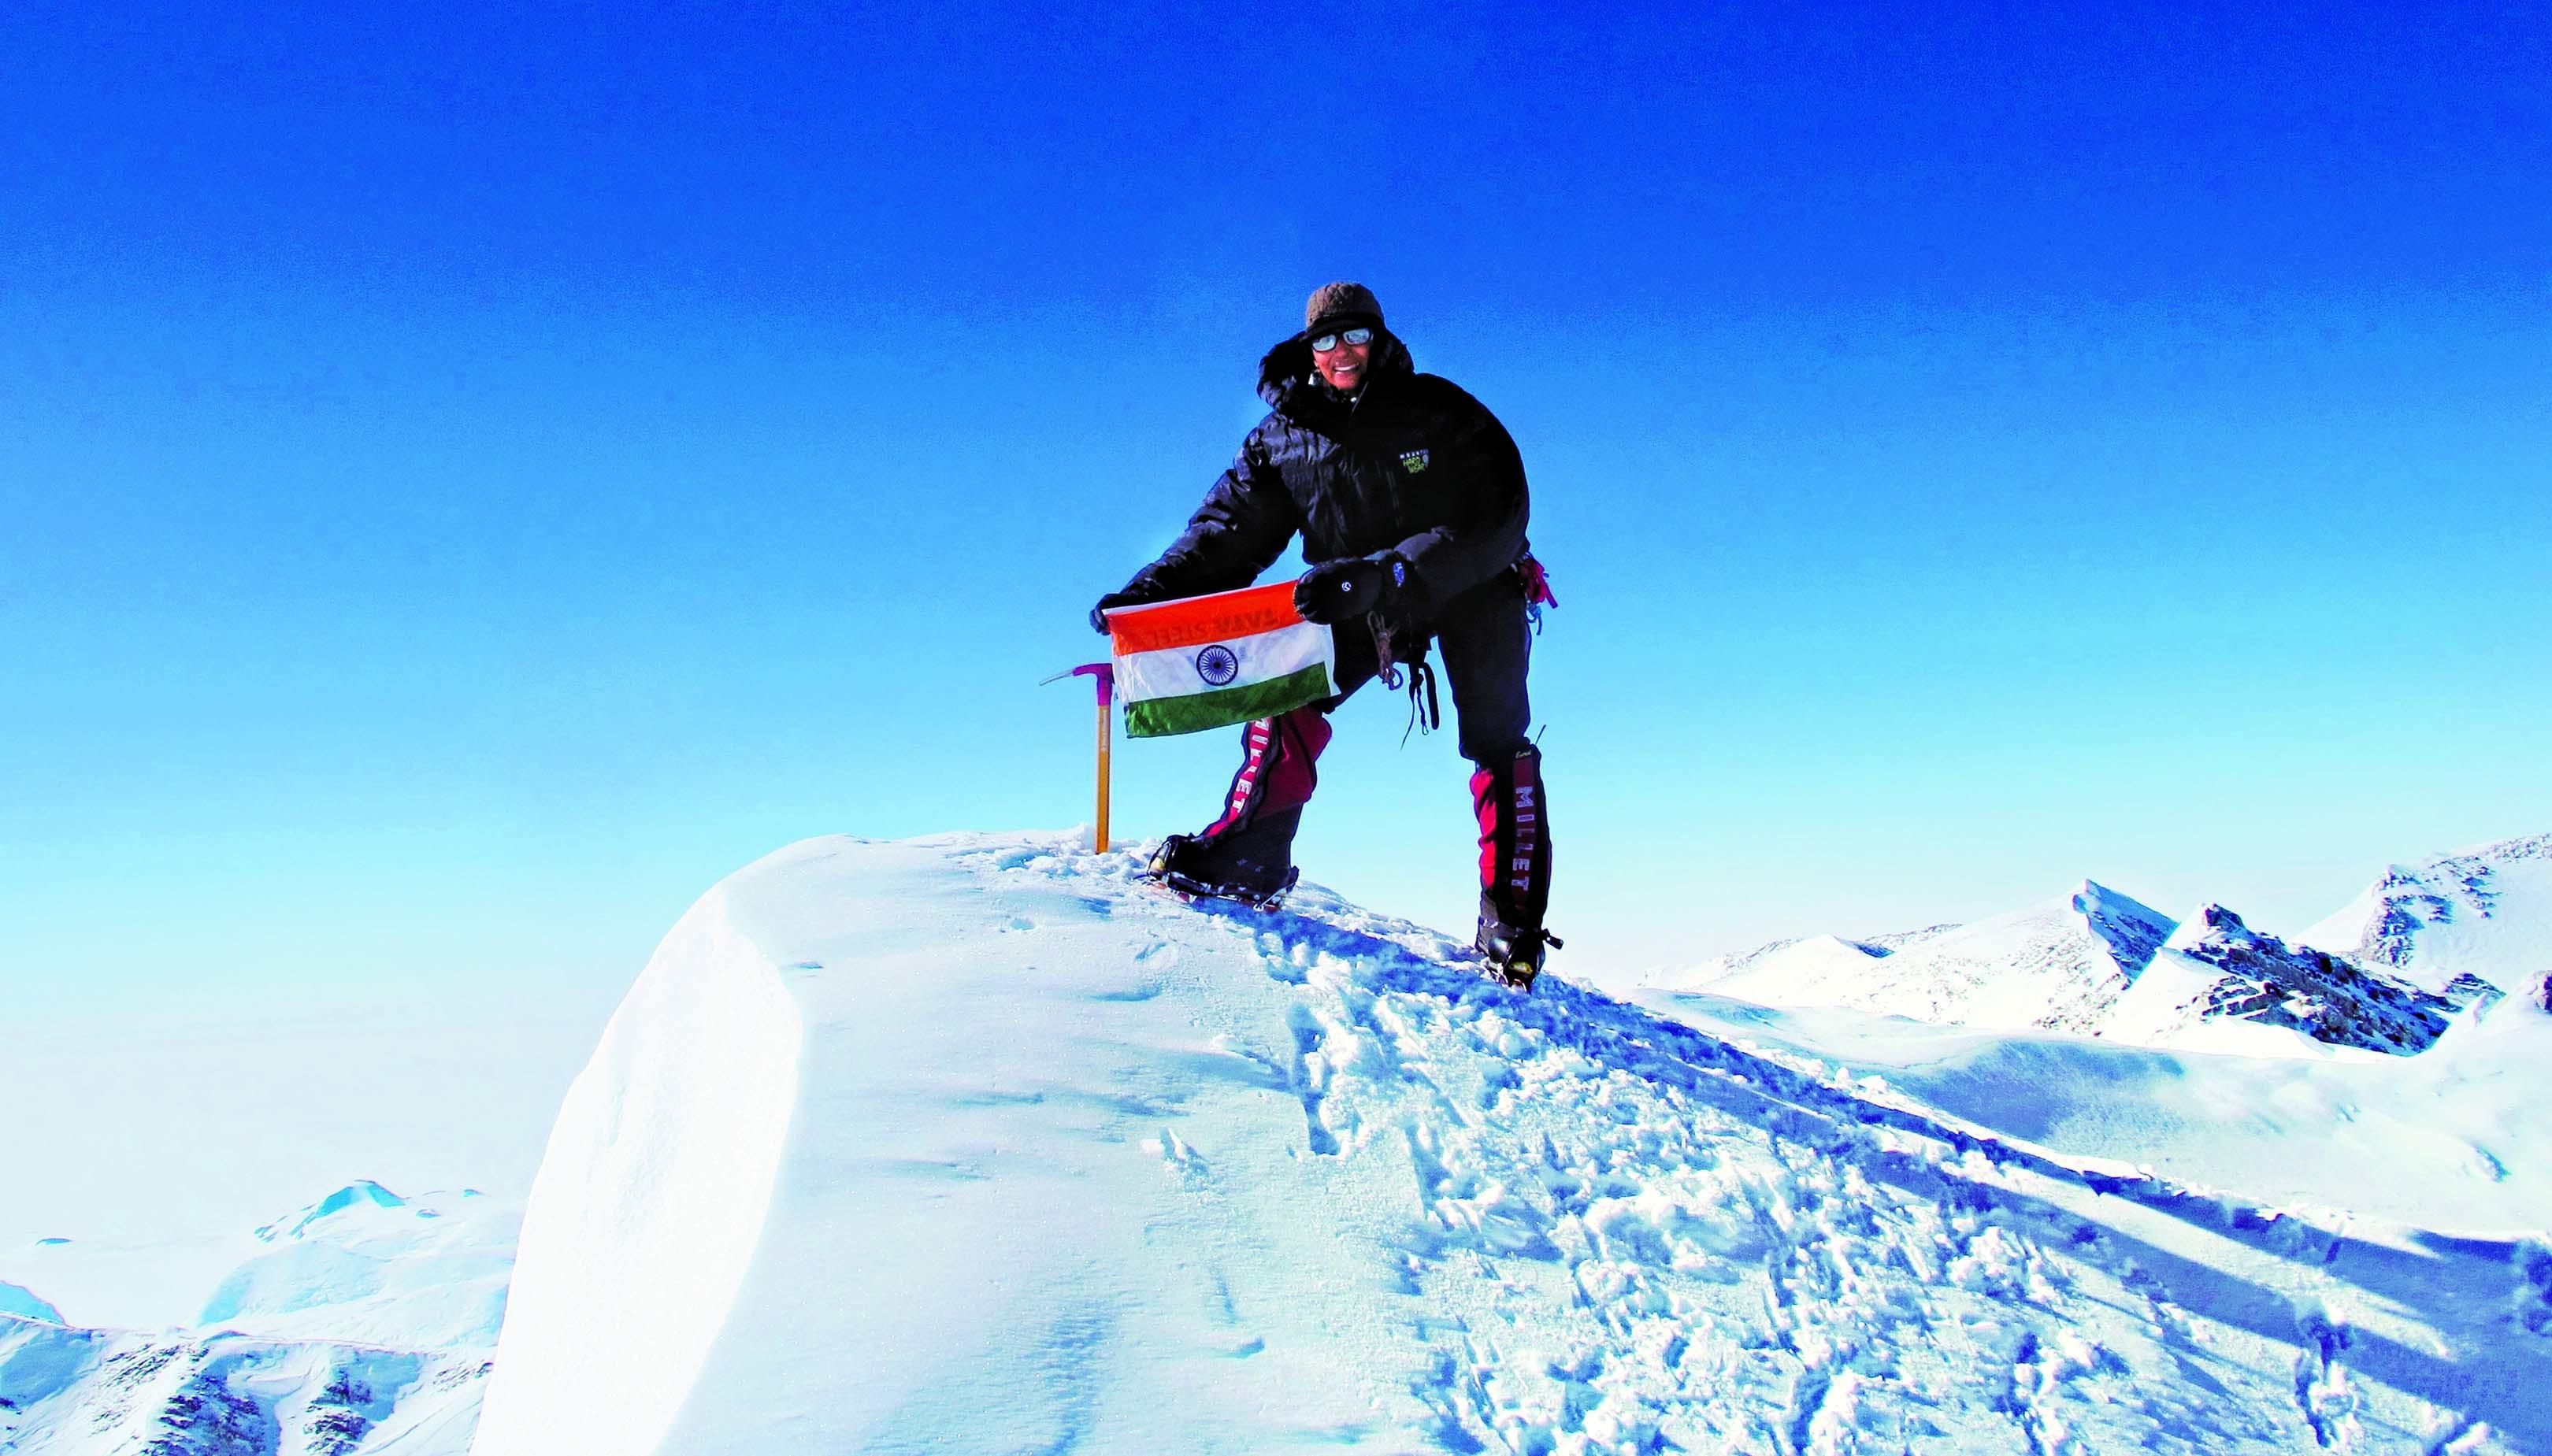 … Mount Everest Spectacular Wallpapers mount everest hd image